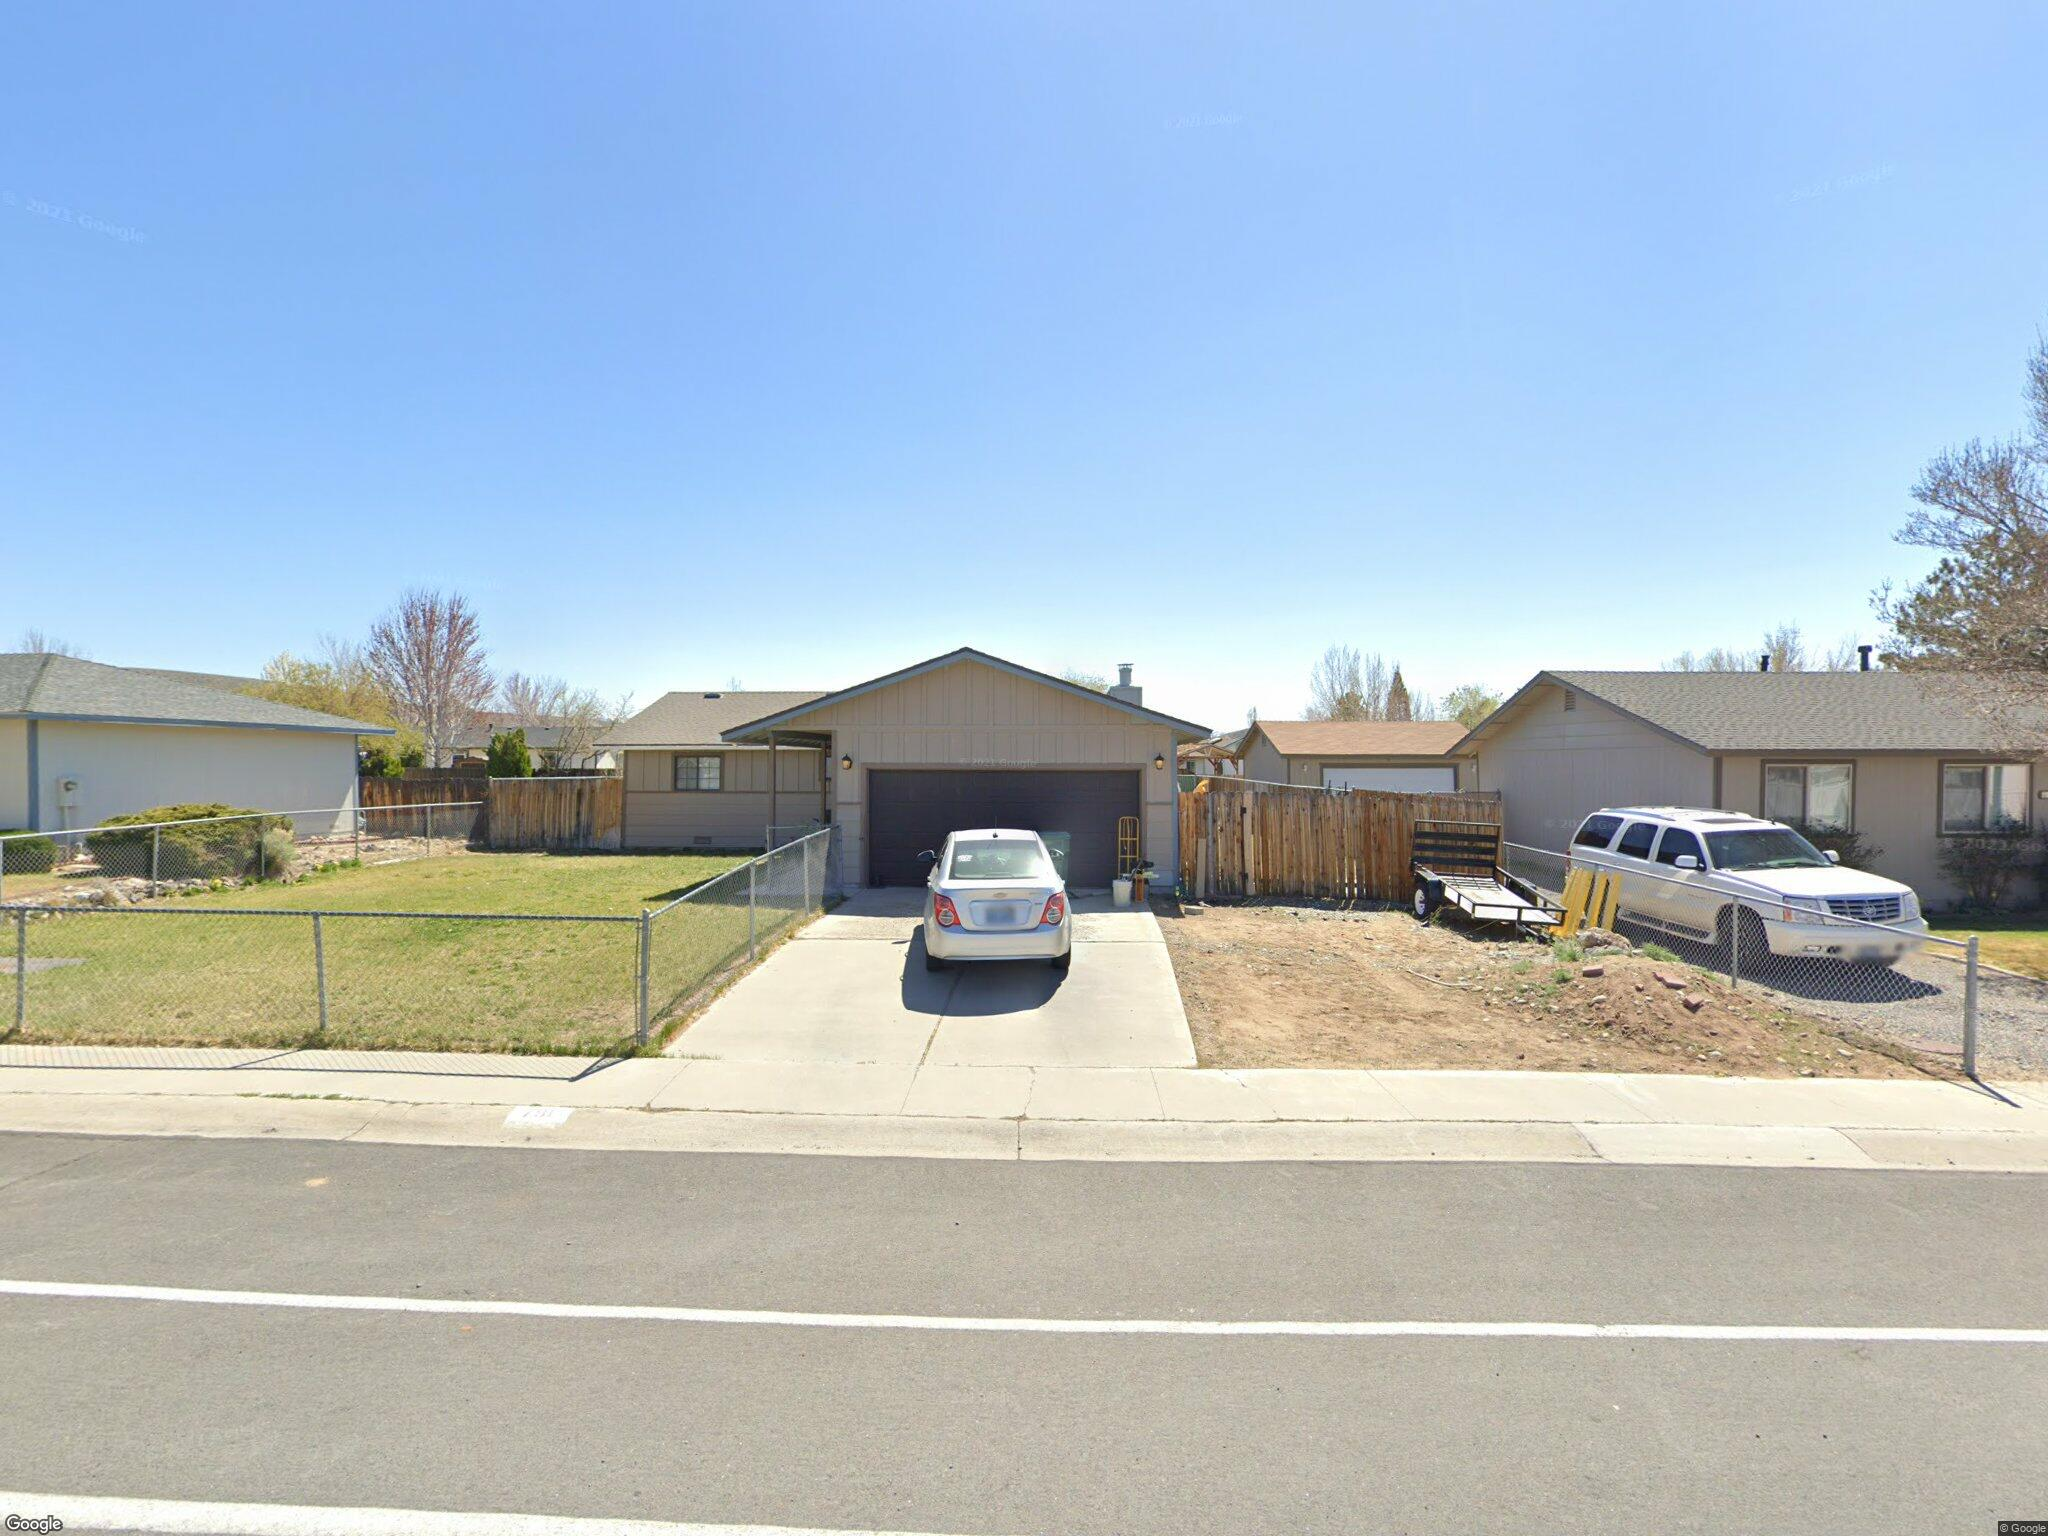 791 Bluerock Rd, Gardnerville, NV 89460 | Trulia